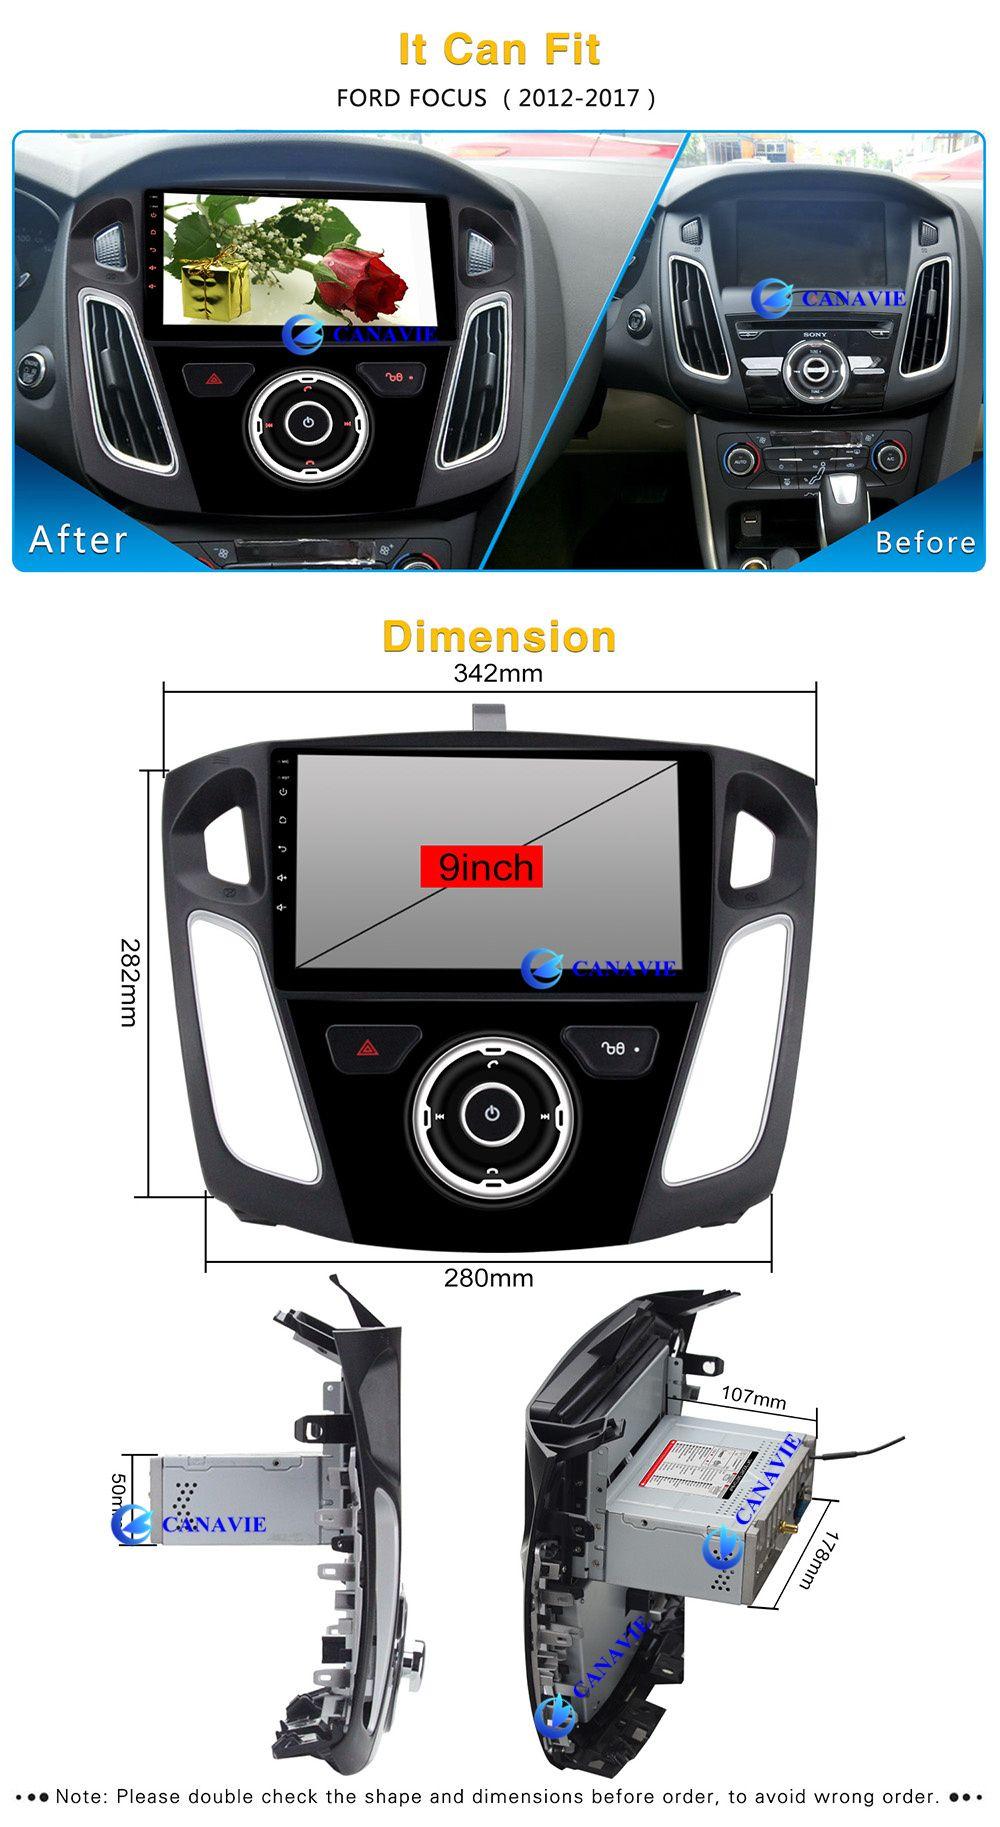 9 Android Autoradio Car Multimedia Stereo Gps Navigation Dvd Radio Audio Head Unit Ford Focus 3 2012 2013 2014 2015 2016 2017 Gps Navigation Ford Focus Head Unit